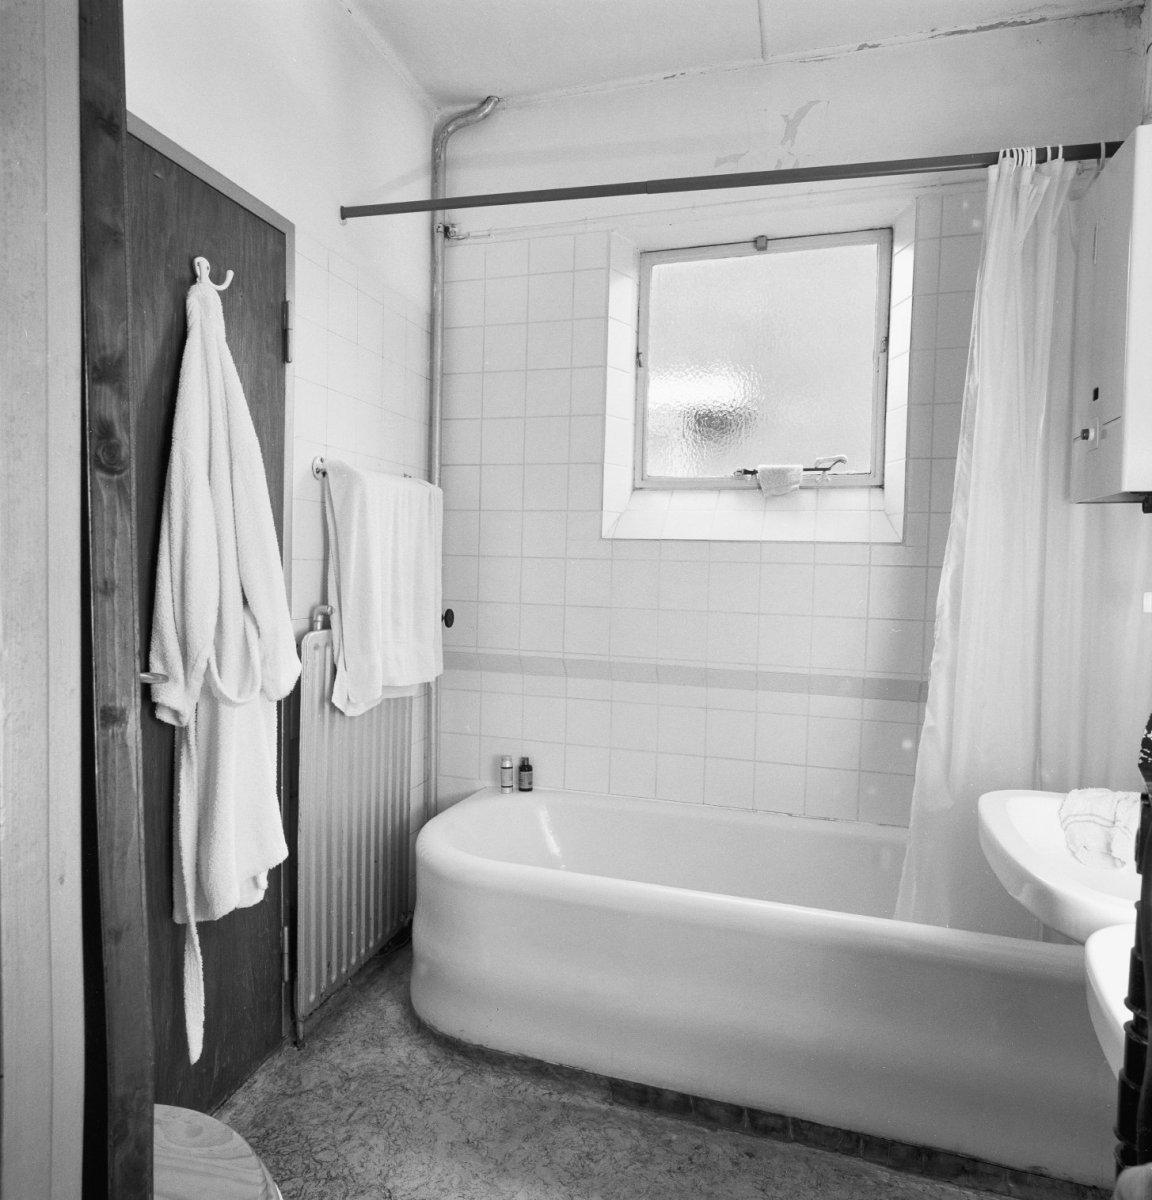 File interieur badkamer met bad utrecht 20340435 wikimedia commons - Interieur badkamer ...